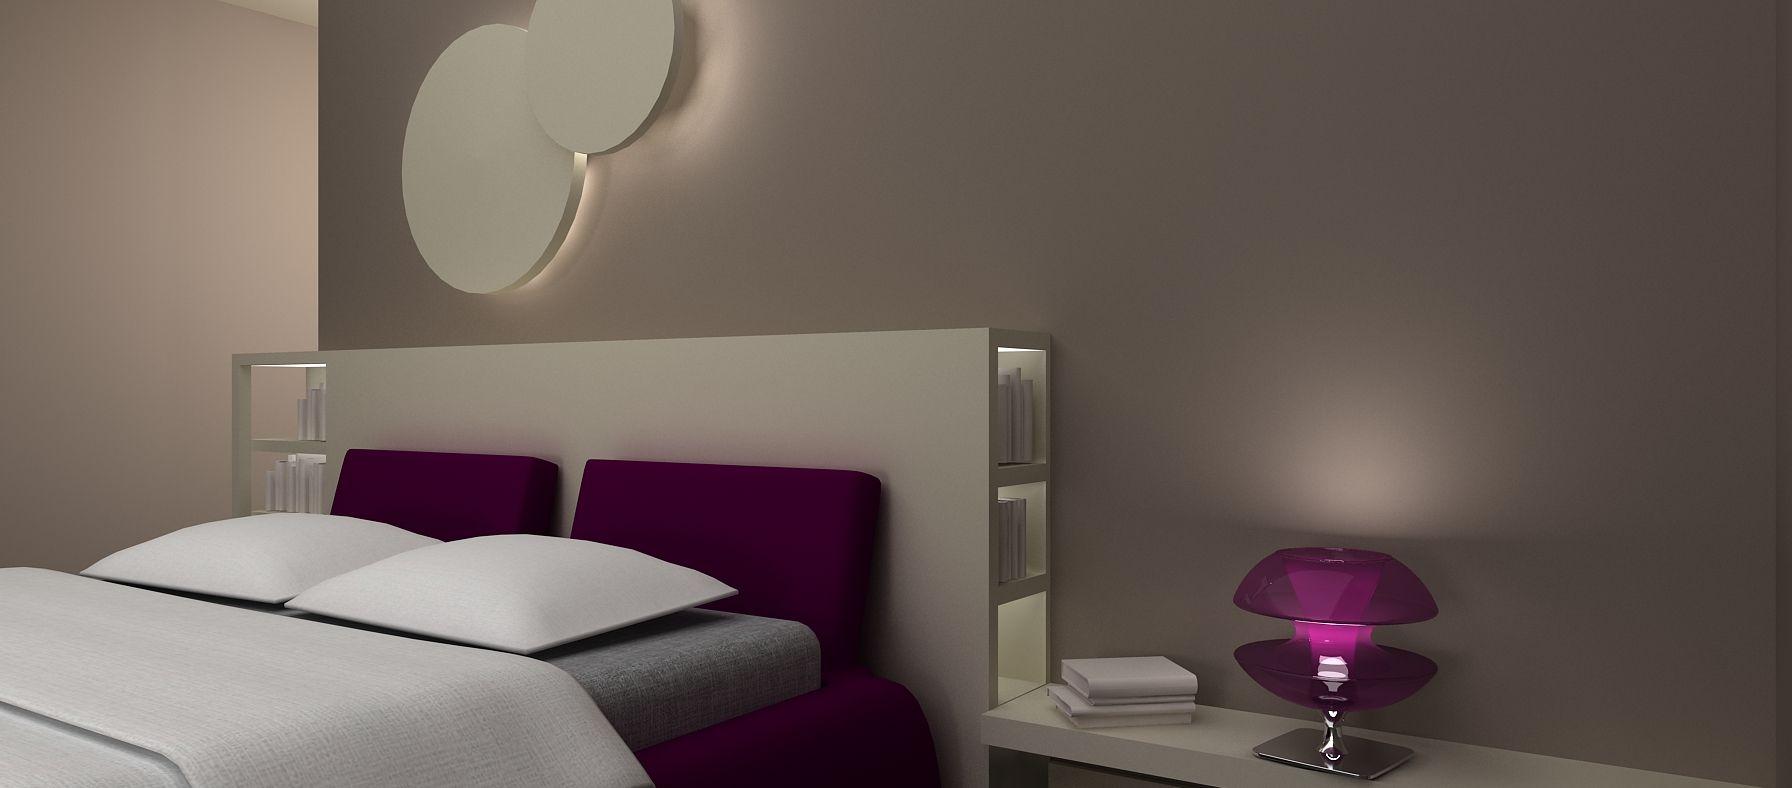 Portfolio lavori in cartongesso bedroom pinterest - Cartongesso in camera da letto ...